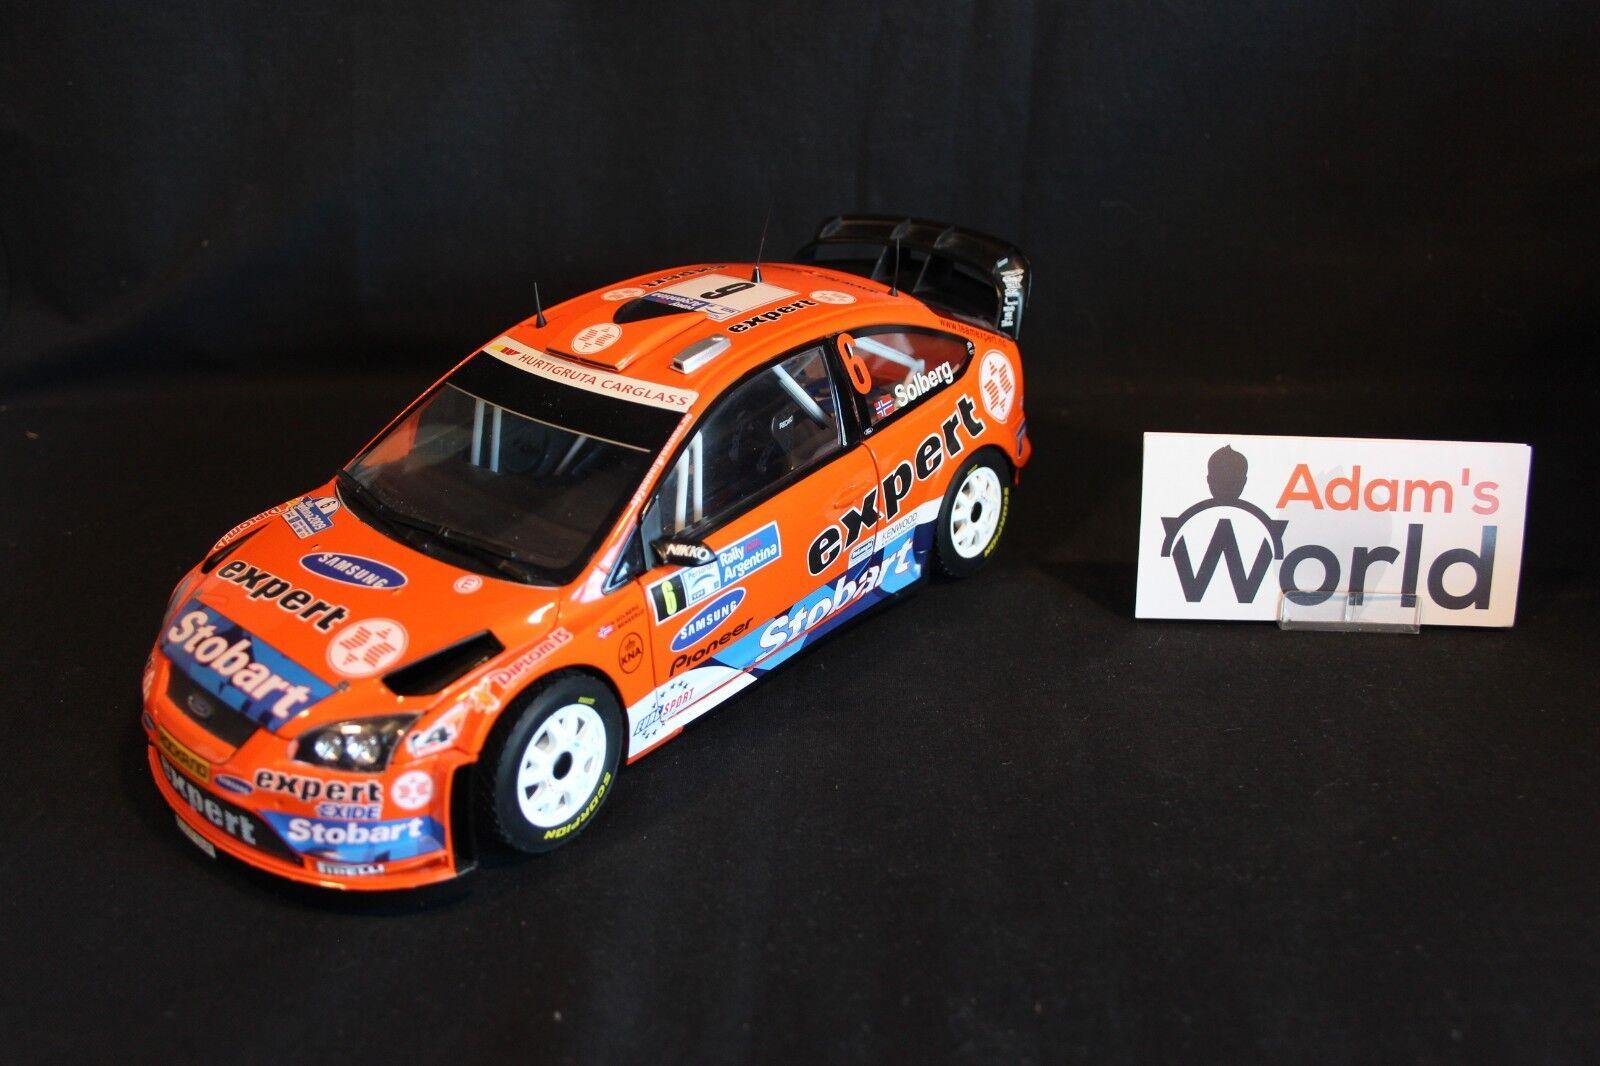 Sun Star Ford Focus RS  WRC 2009 1 18  6 Solberg   Hommeskerud Argentina (JvdM)  offre spéciale